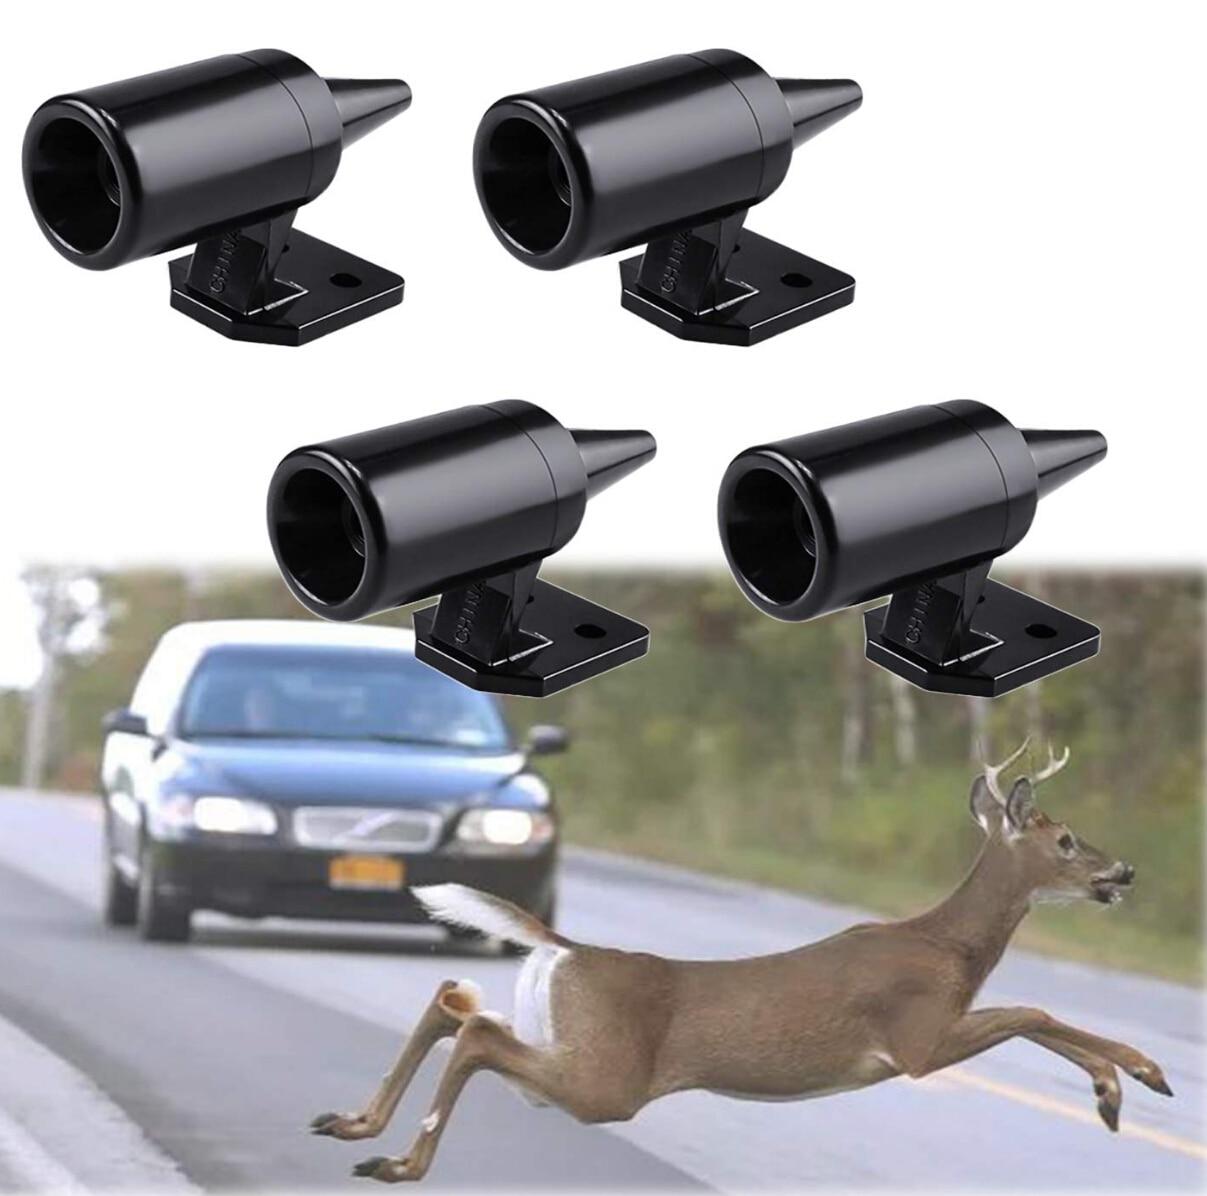 1pc Animal Deer Warning Alarm for hyundai veloster audi a4 b8 chrysler 300 mustang 2016 honda crv civic 2017 subaru wrx